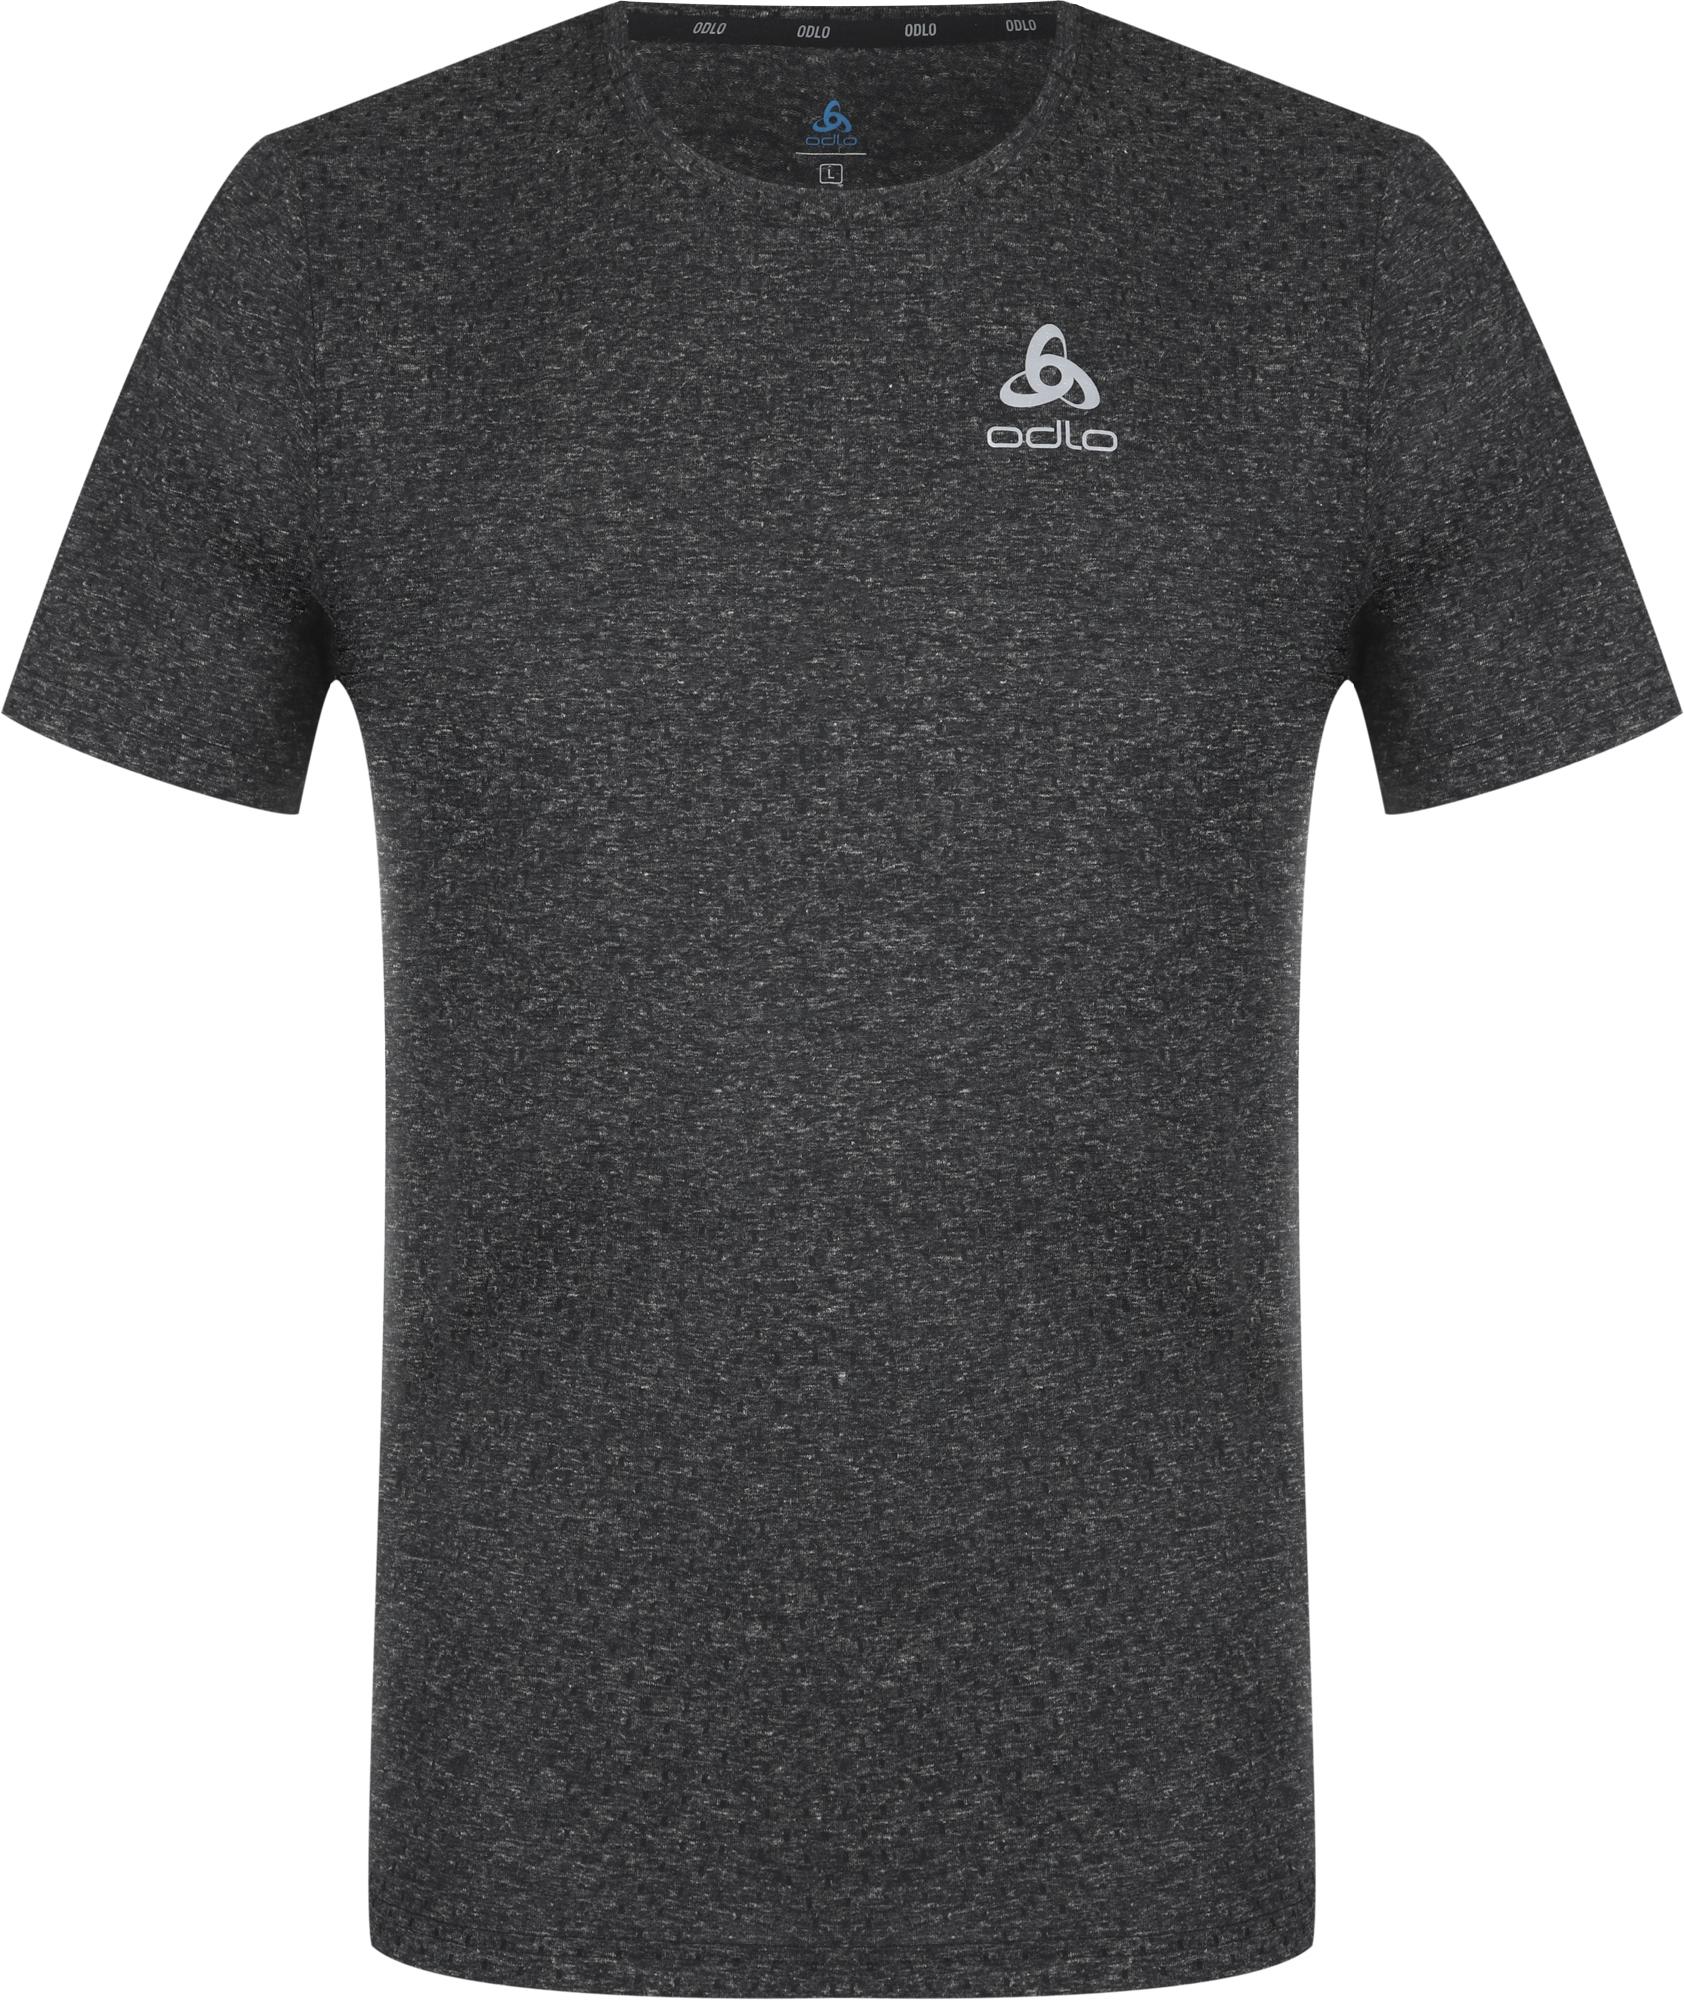 Odlo Футболка мужская Odlo Millennium, размер 46-48 odlo футболка женская odlo millennium размер 46 48